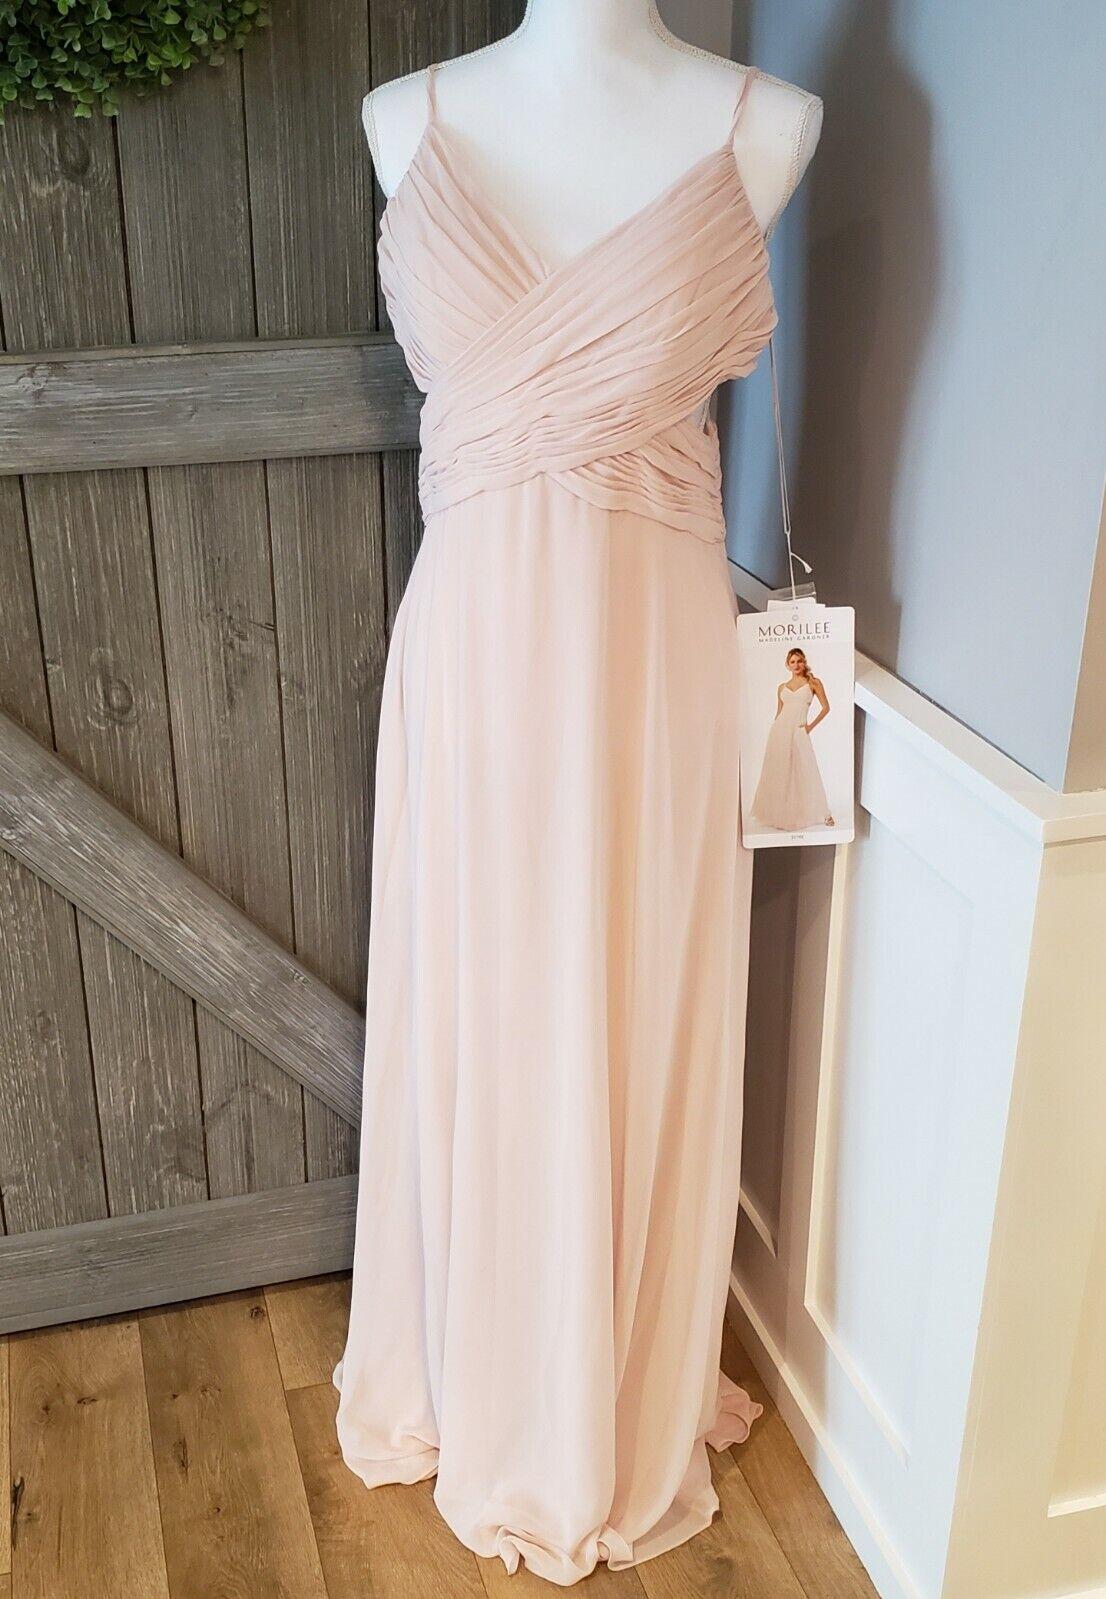 NWT MORILEE by Madeline Gardner 21702 Chiffon Bridesmaid Dress Blush Color Sz 12